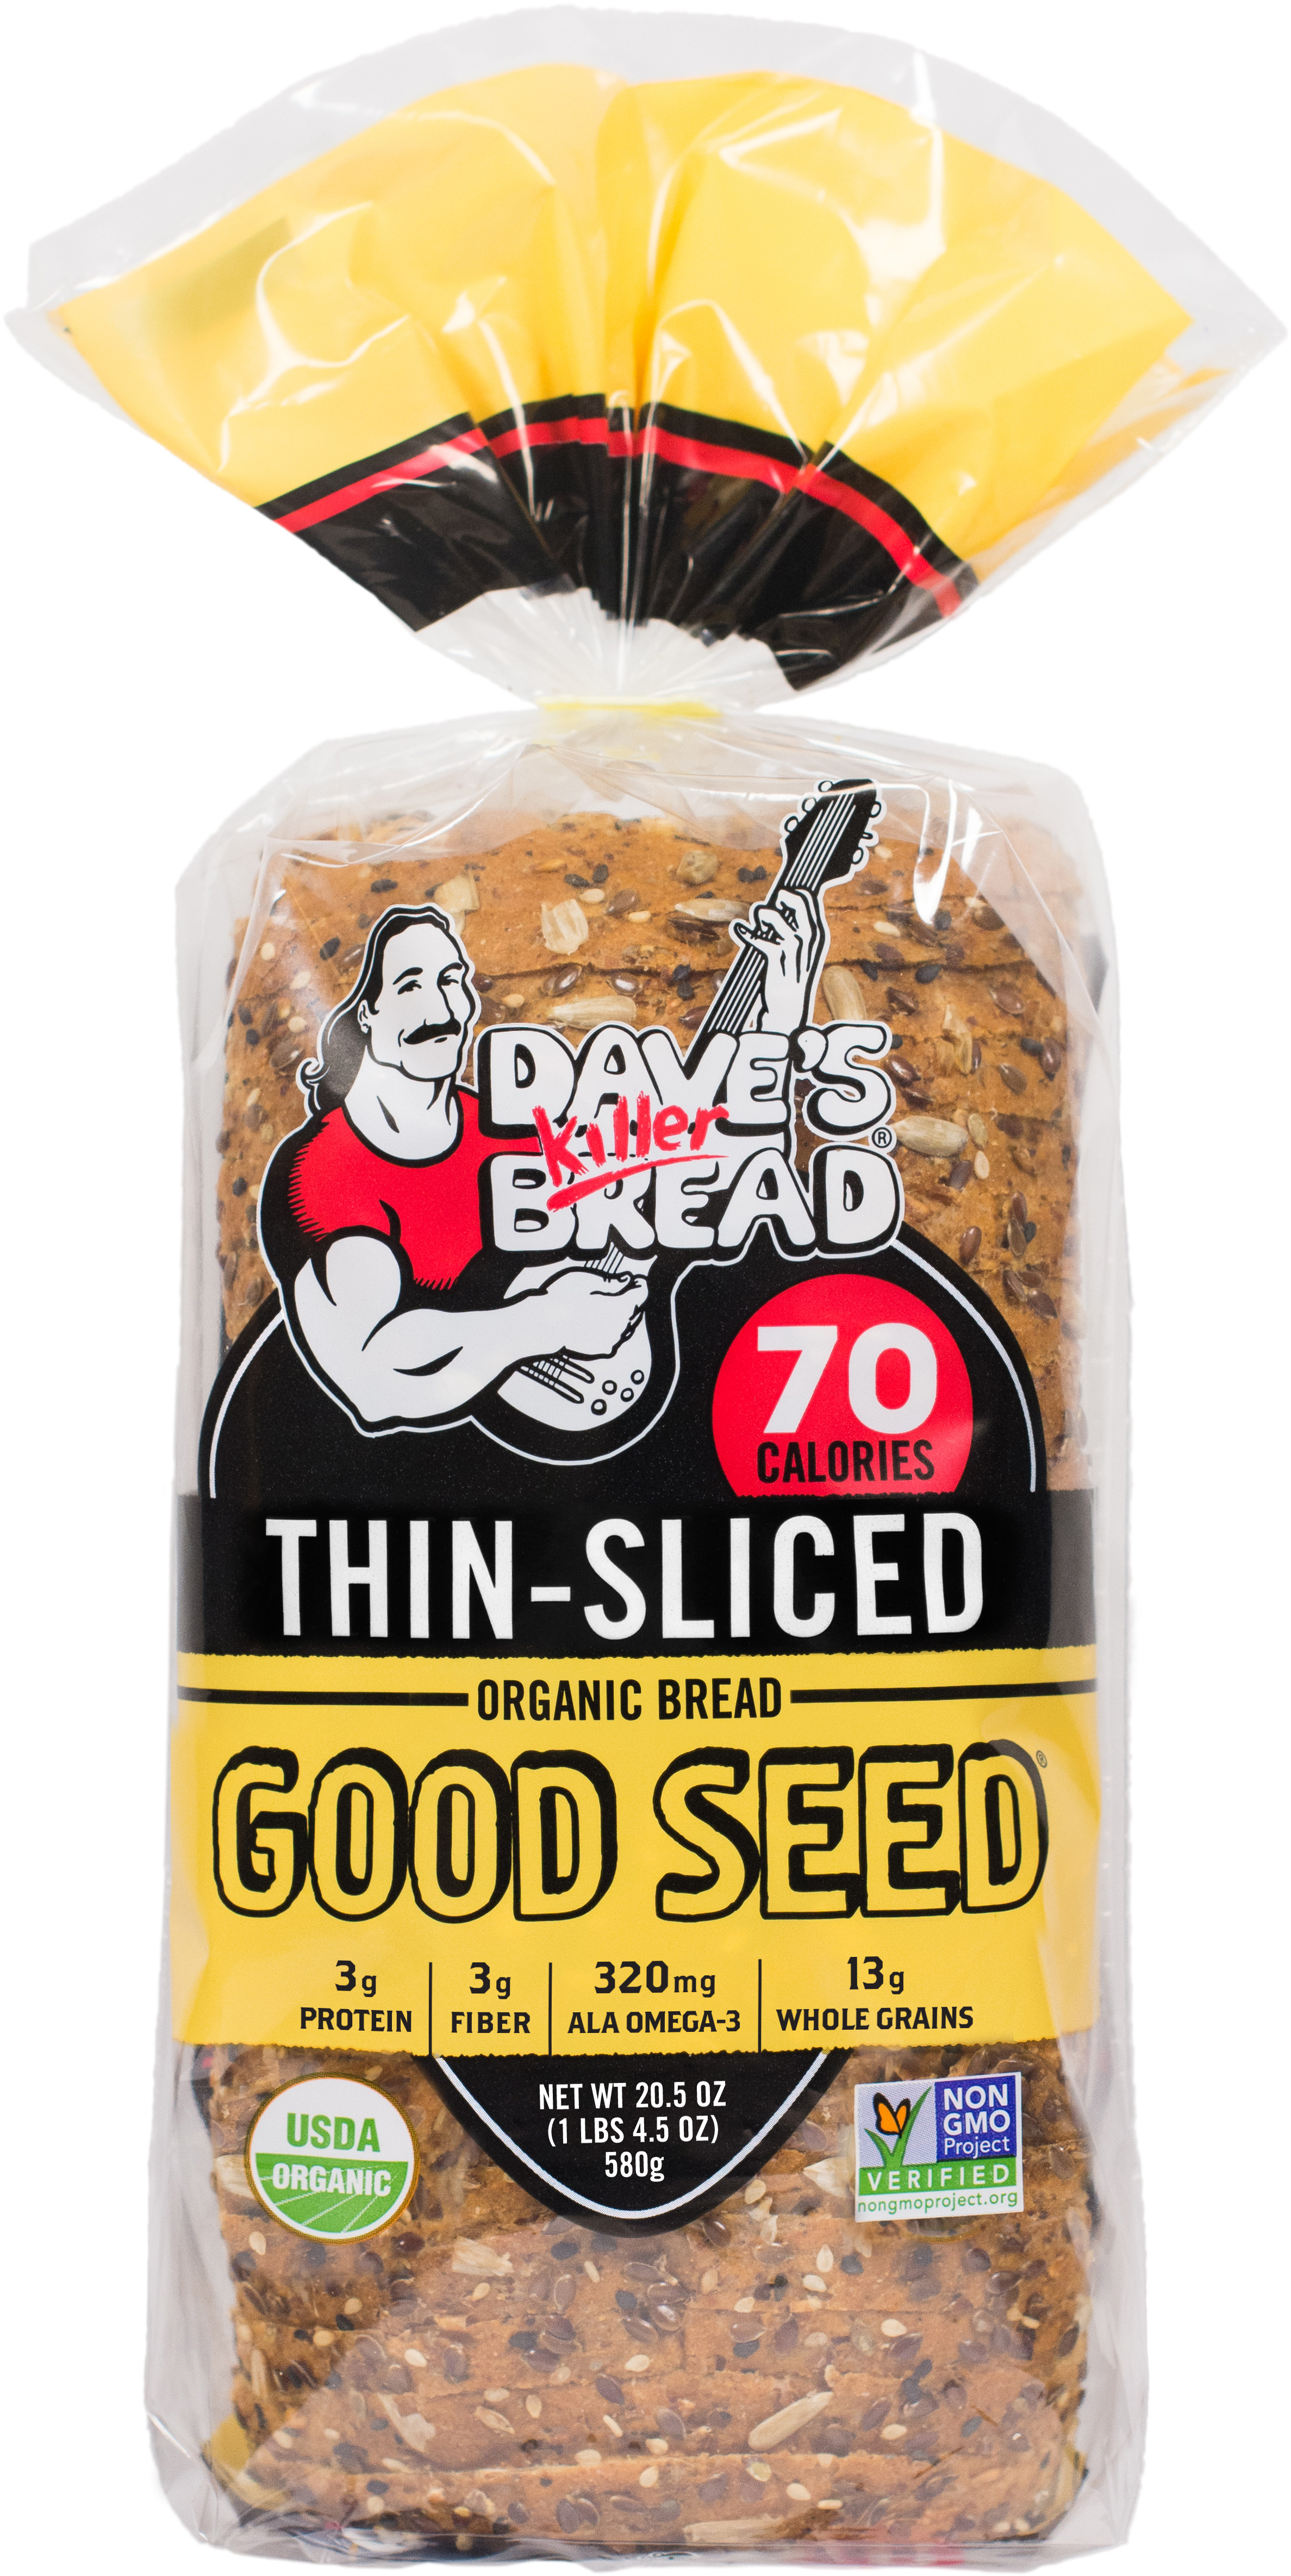 Good Seed Thin-Sliced White Large 2019_0930a.jpg